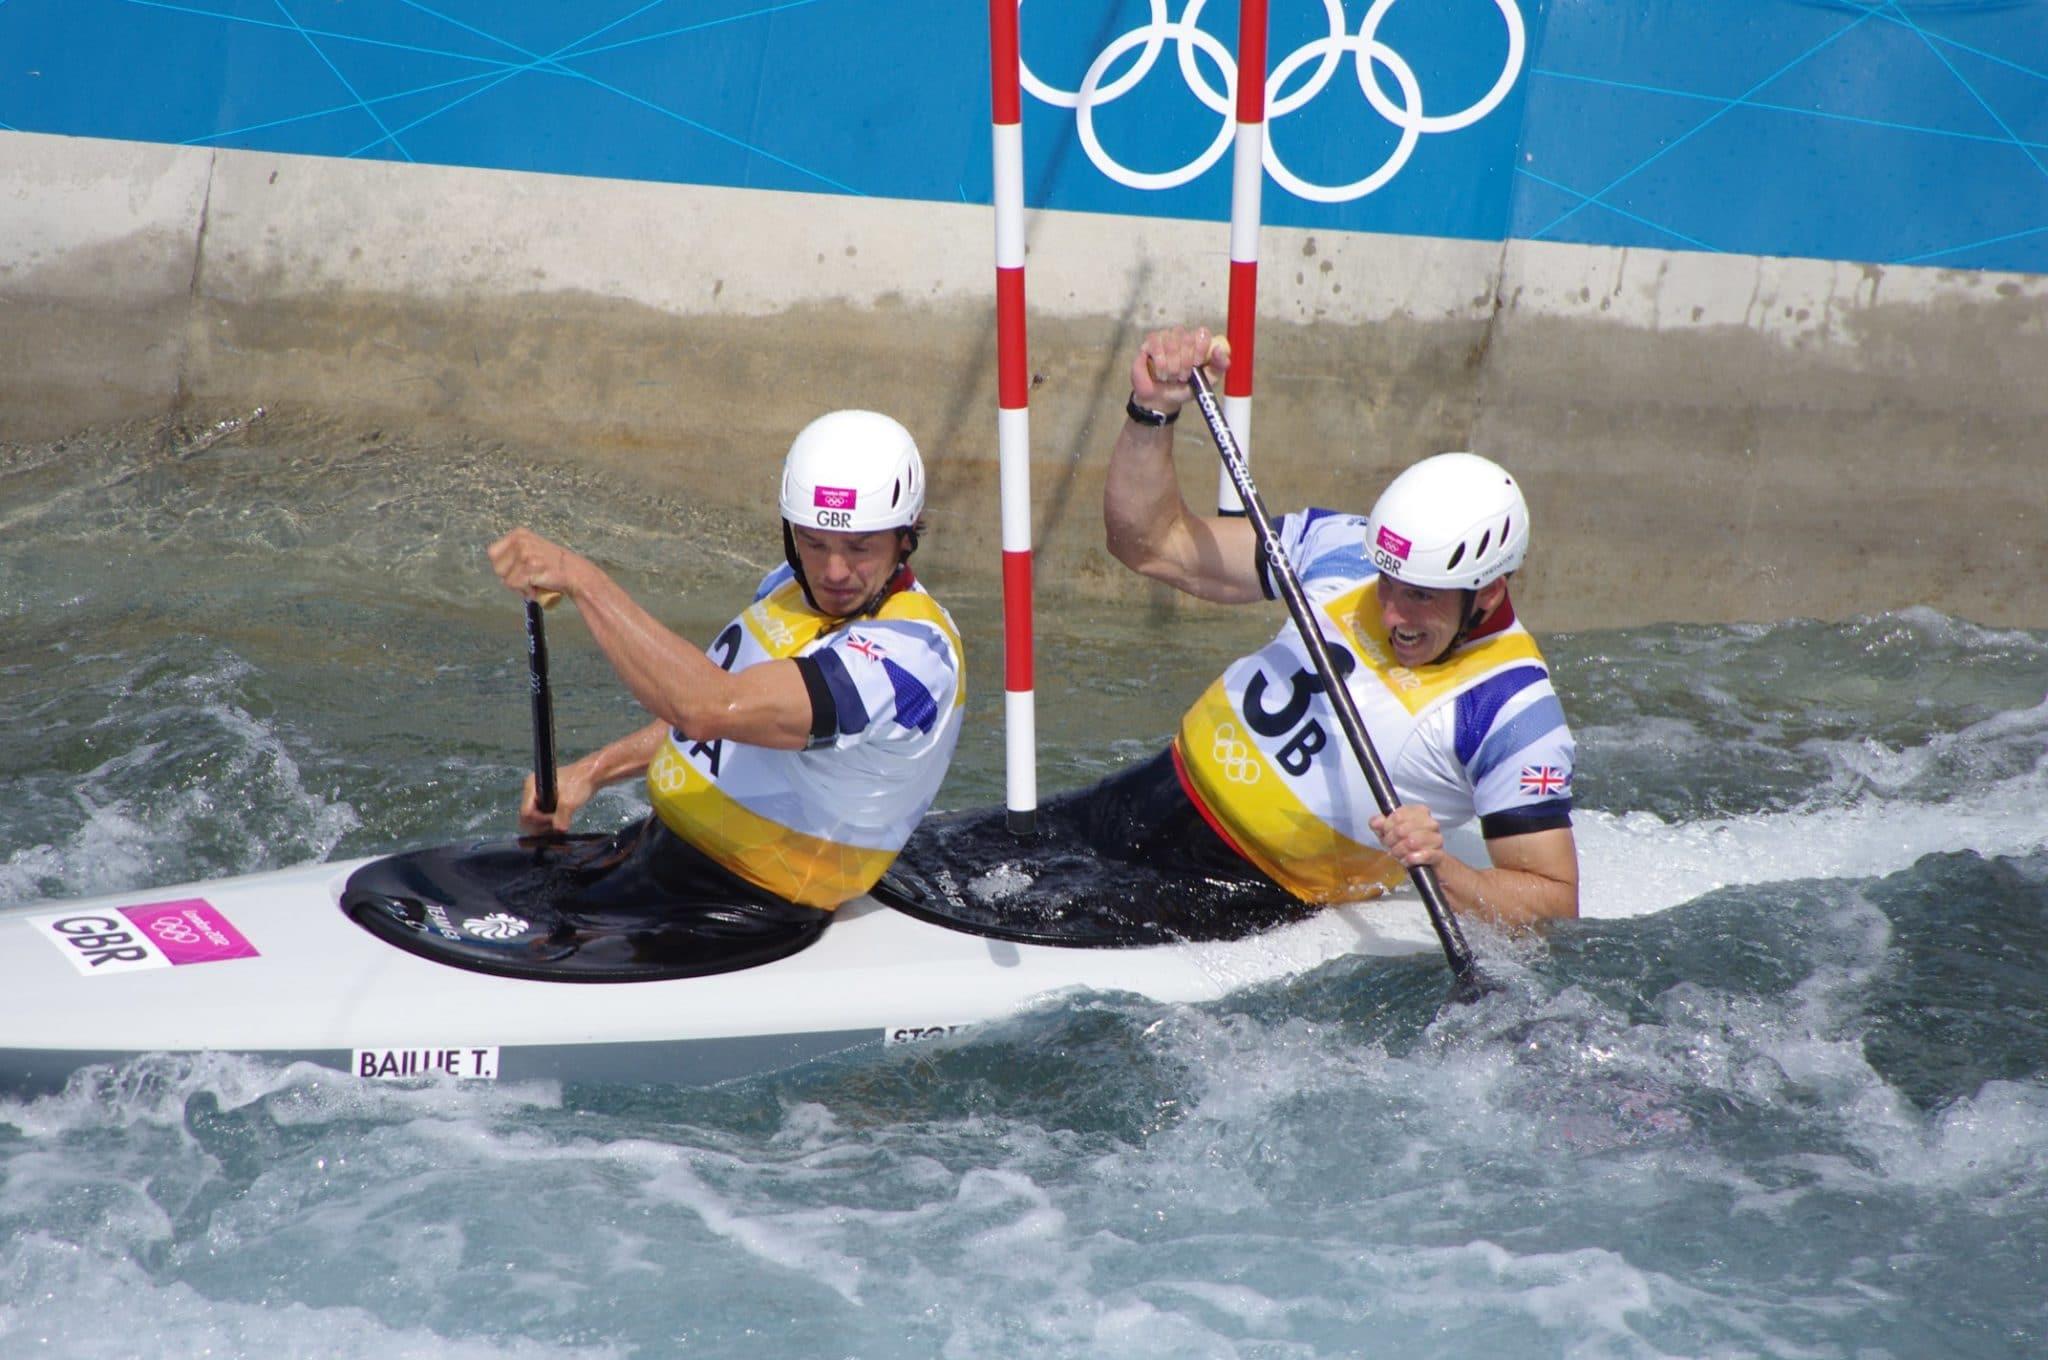 Slalom canoeing 2012 Olympics C2 GBR Timothy Baillie and Etienne Stott 3